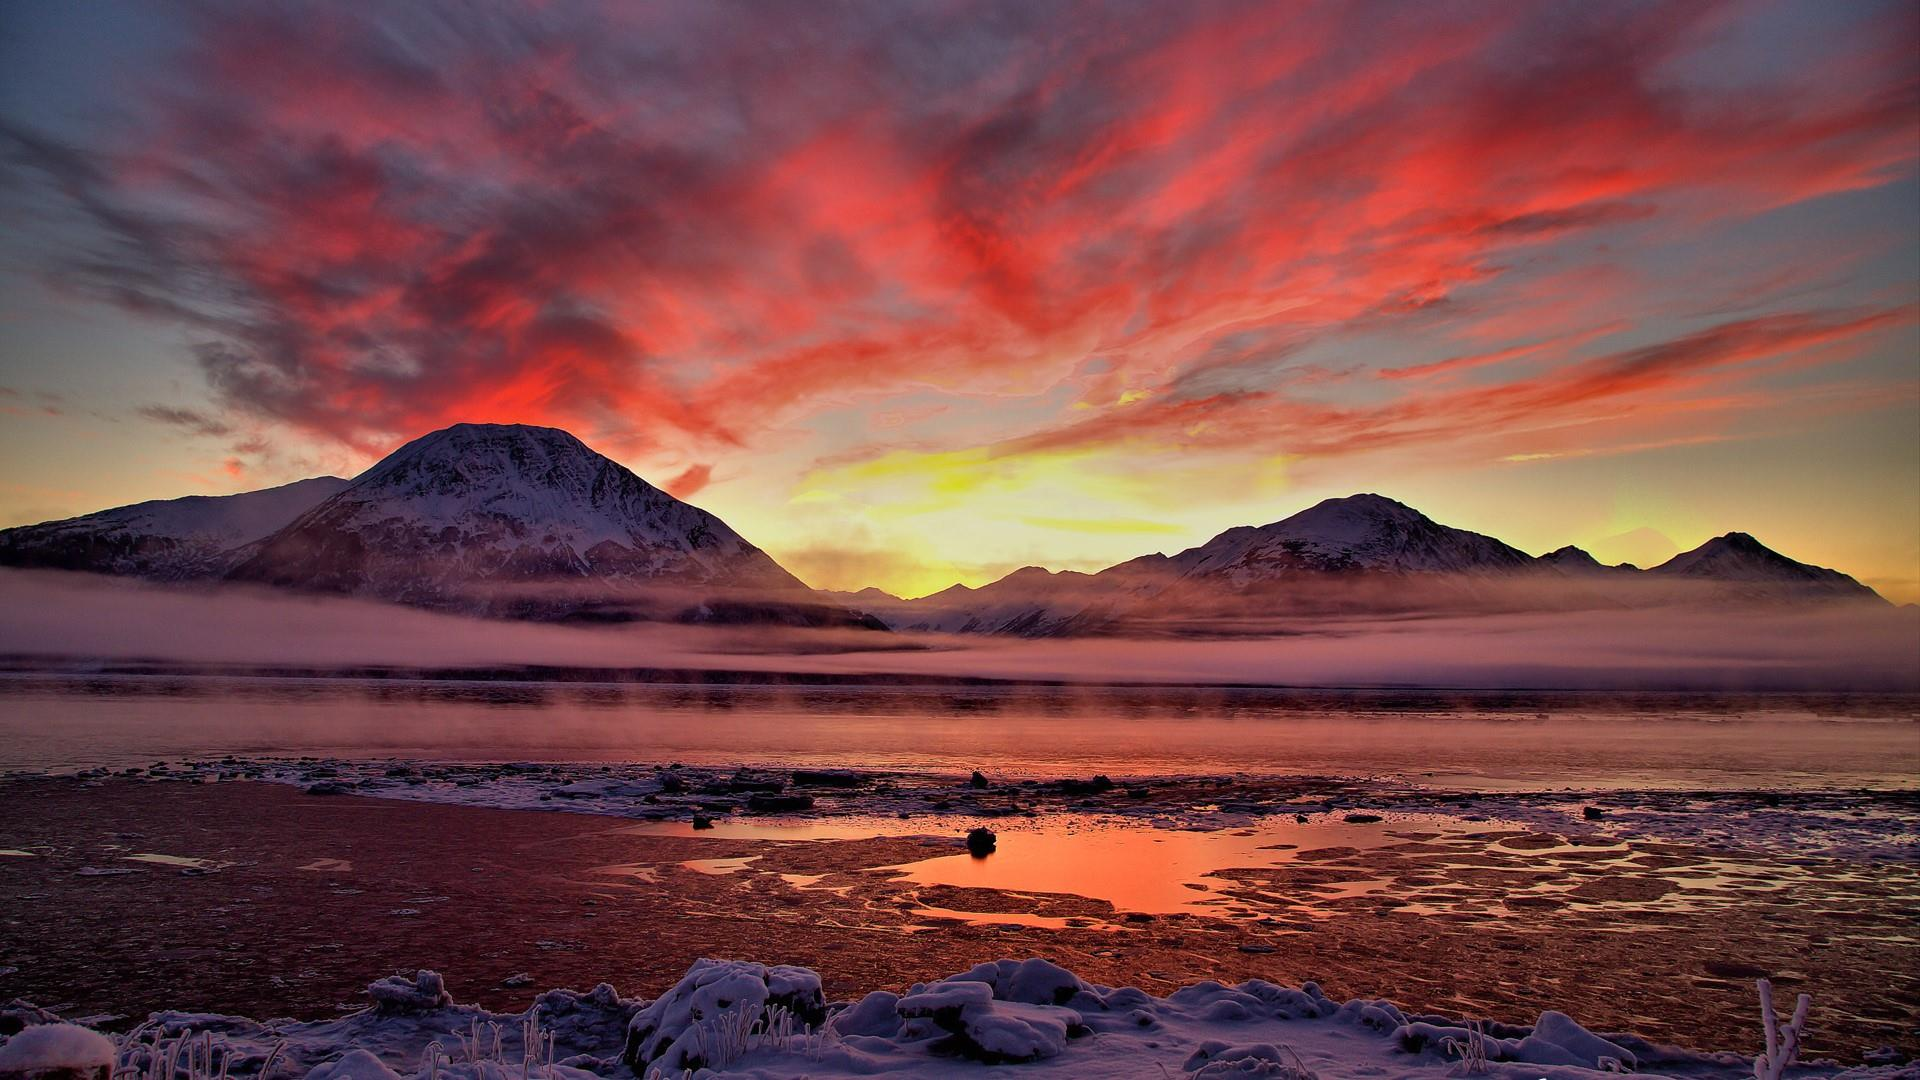 Sunset in Alaska wallpaper